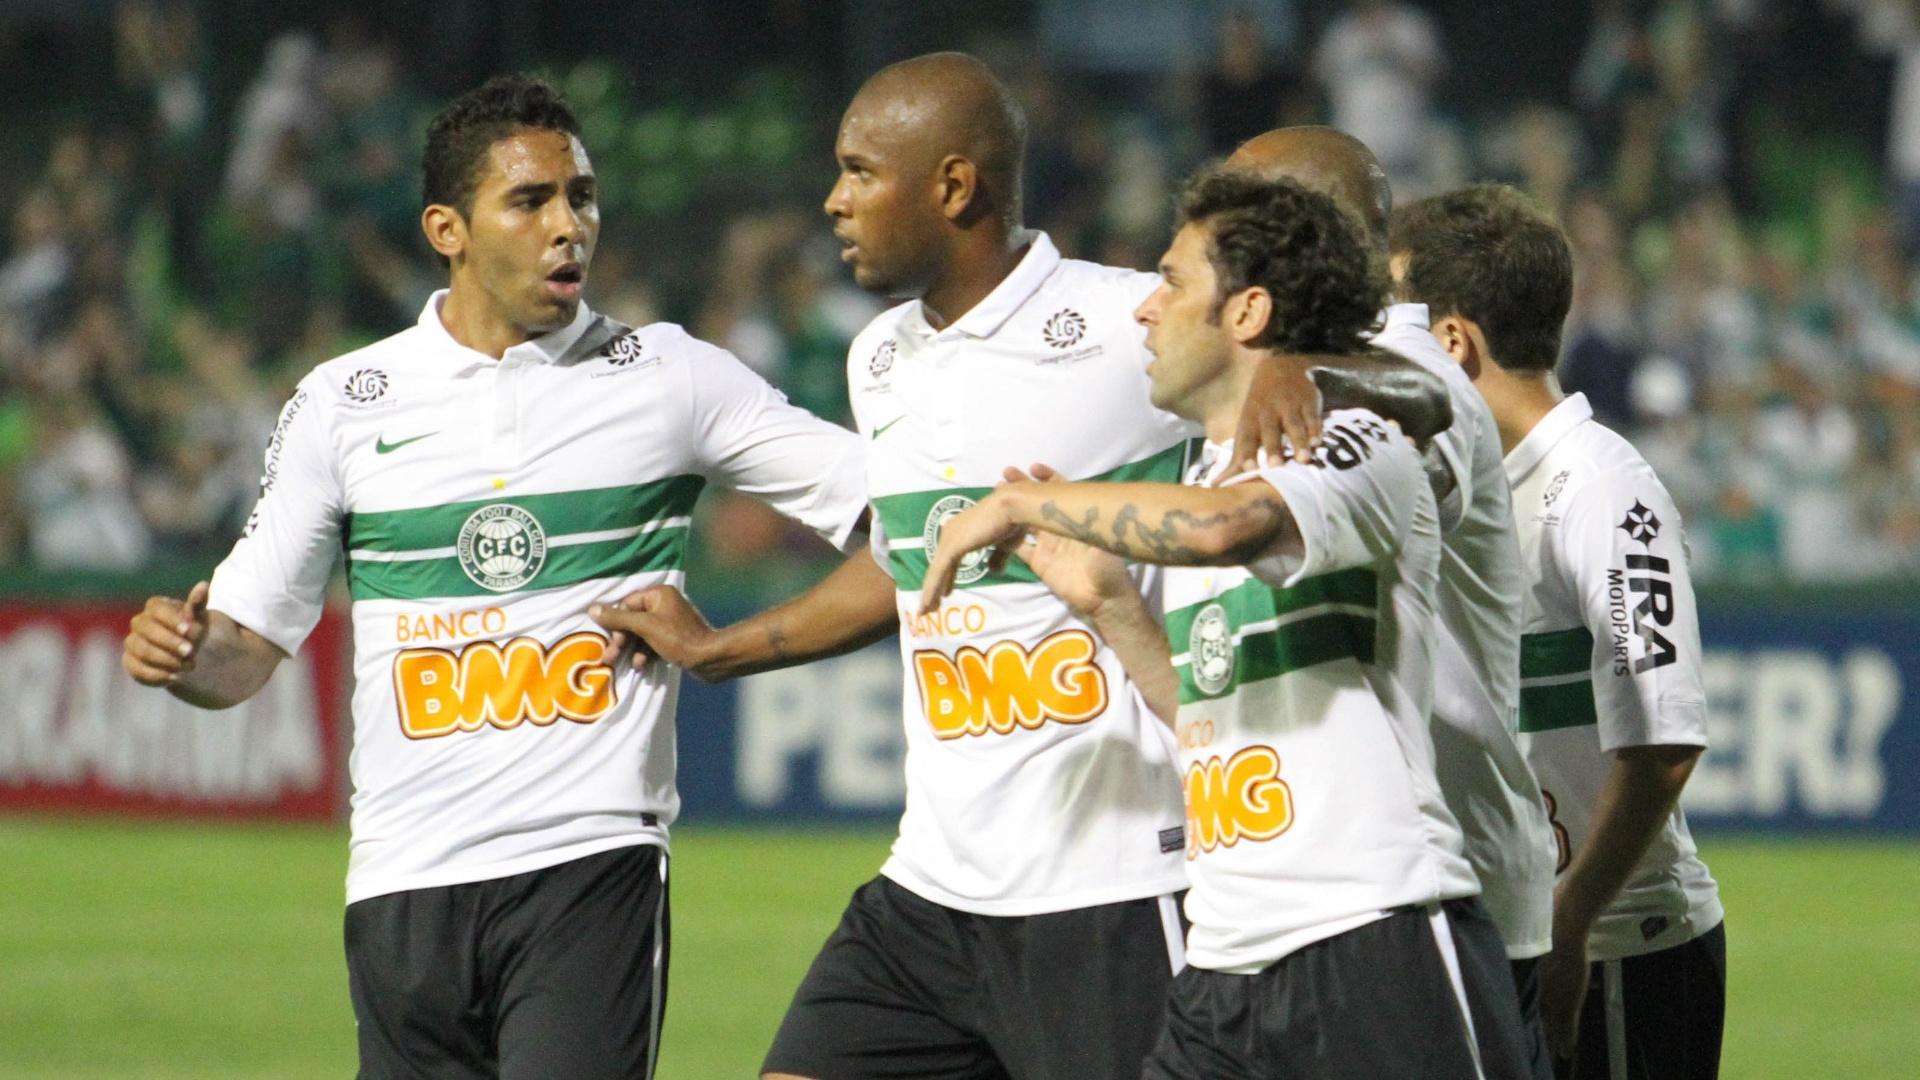 Jogadores do Coritiba comemoram gol marcado por Lincoln, que abriu o placar contra o Flamengo no Couto Pereira (08/09/2012)